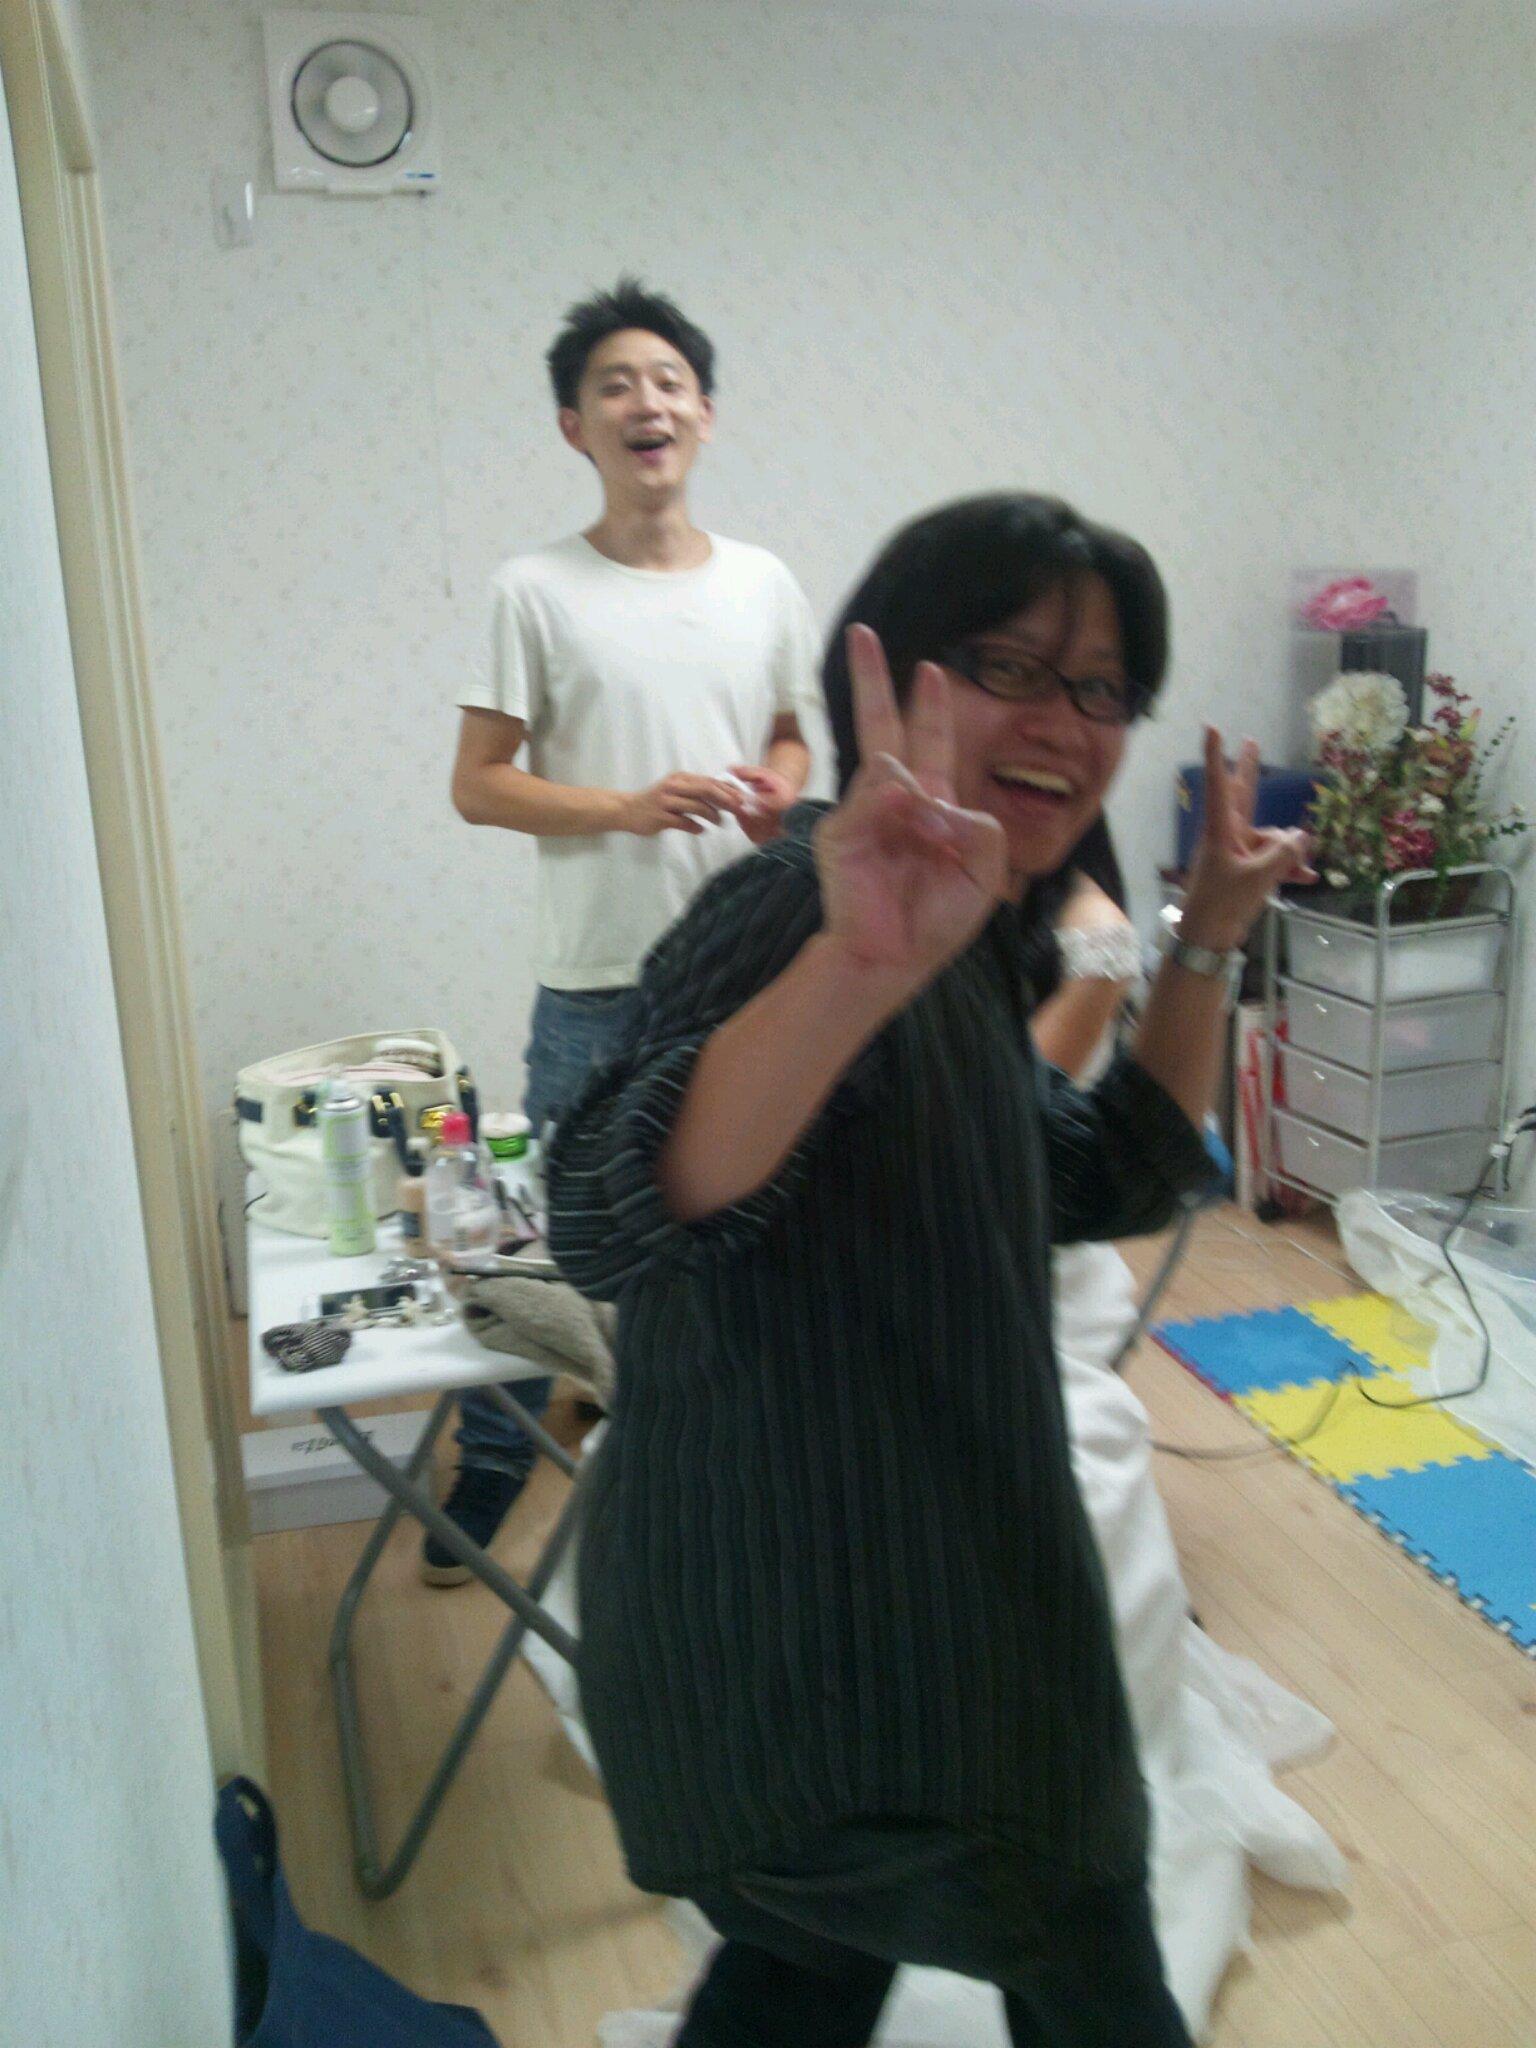 DSC_0638.JPG